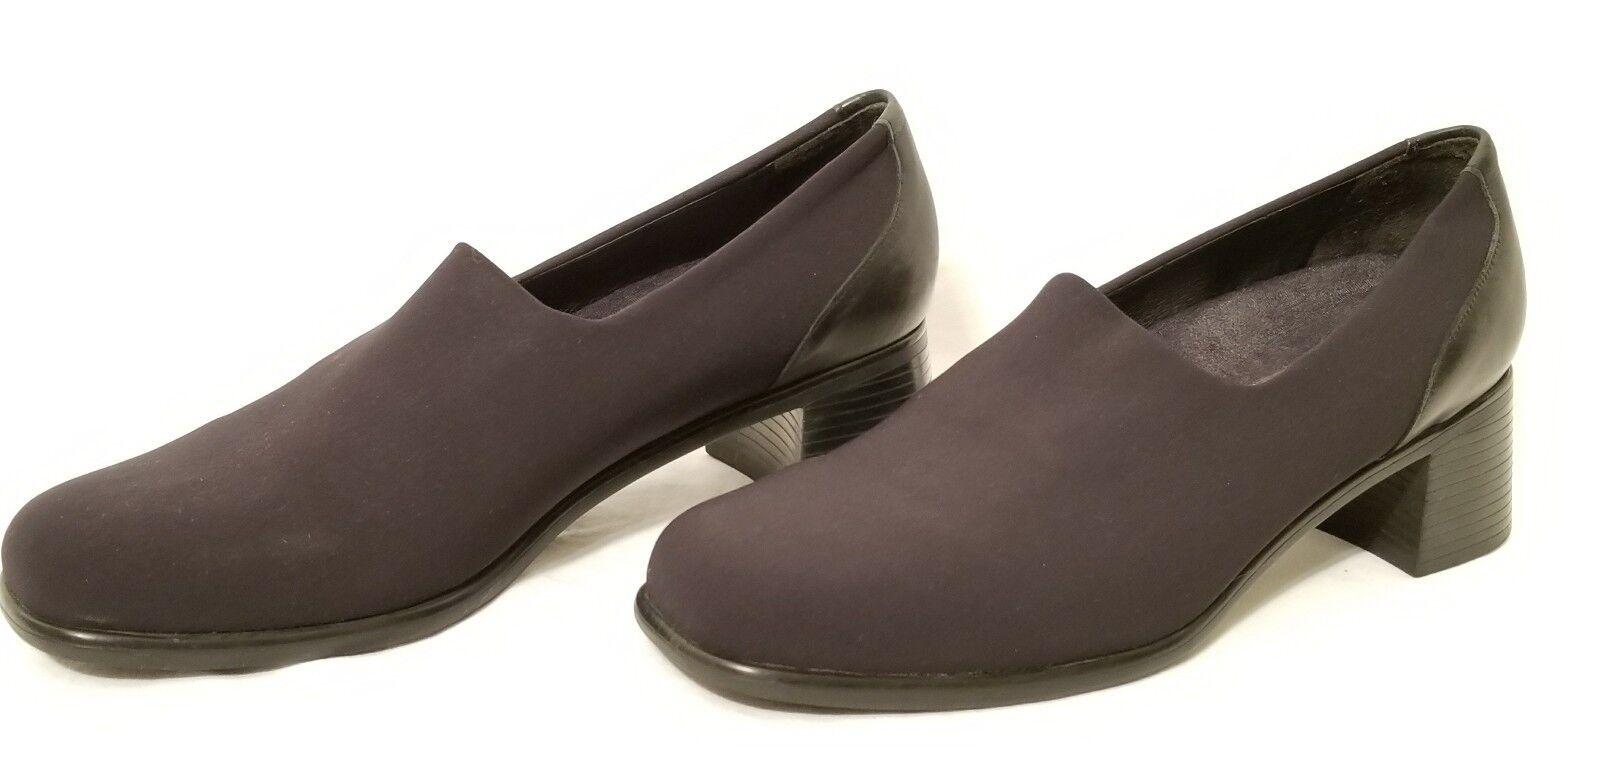 Munro American Women's Black Block Heel Career Comfort 7.5 Fabric Top Shoes Size 7.5 Comfort 8fa5d5